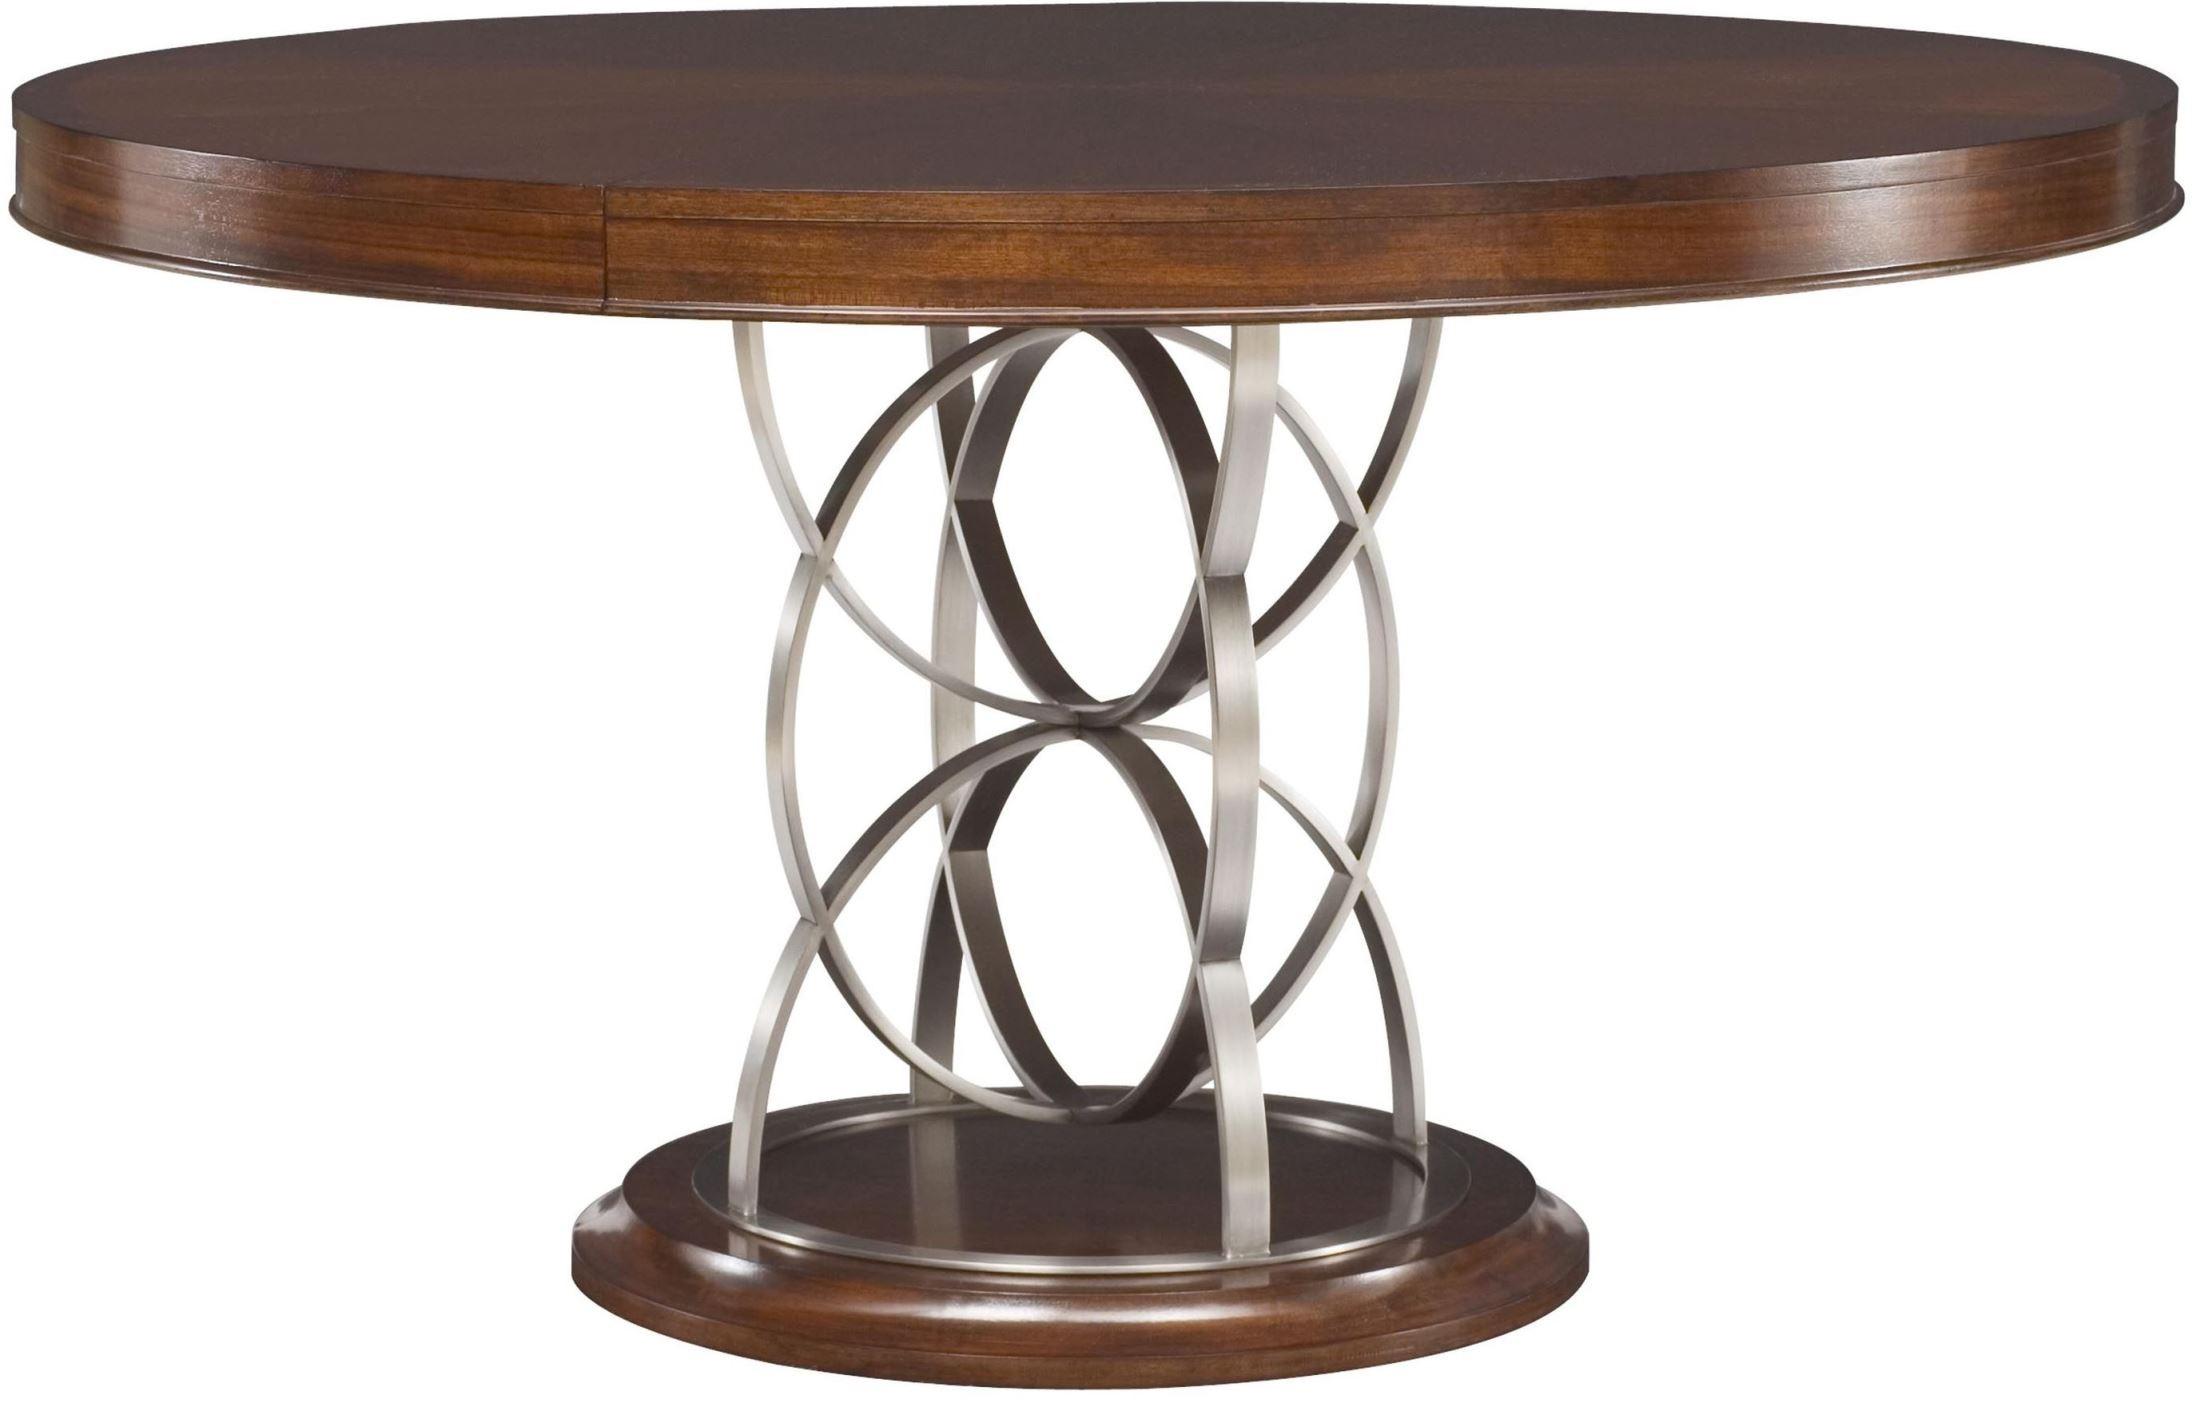 Motif Walnut Extendable Round Pedestal Dining Table 318  : 318 701rsilo from colemanfurniture.com size 2200 x 1415 jpeg 208kB